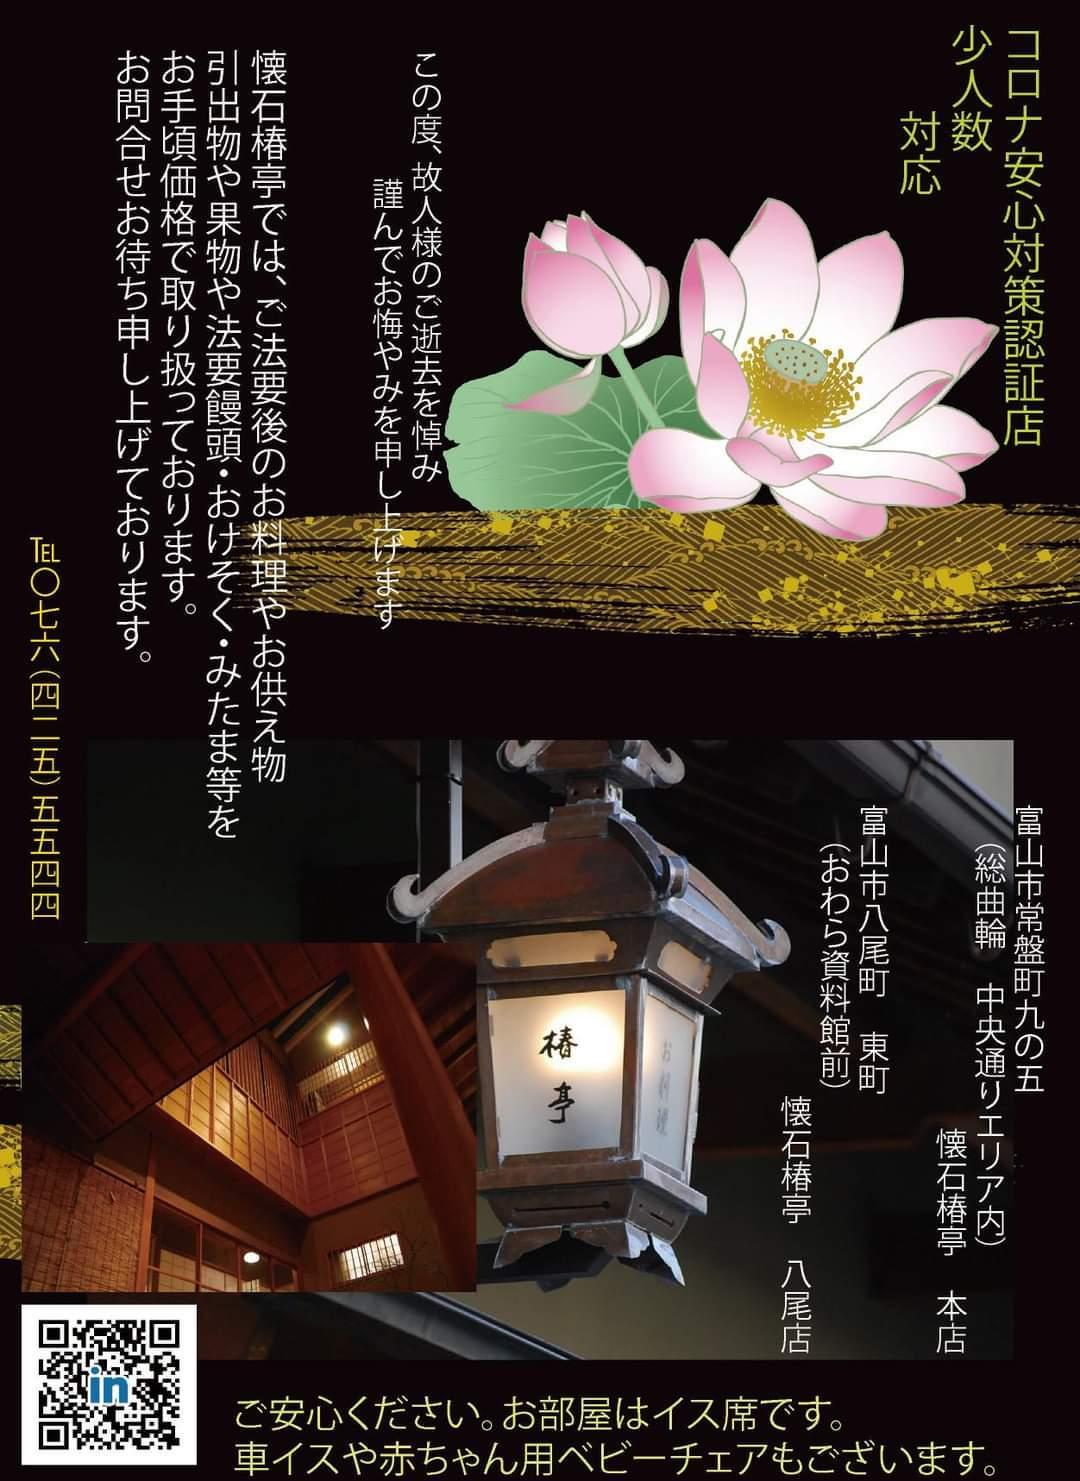 広告宣伝 富山県新型コロナ安心対策認証店_d0377709_10241490.jpg